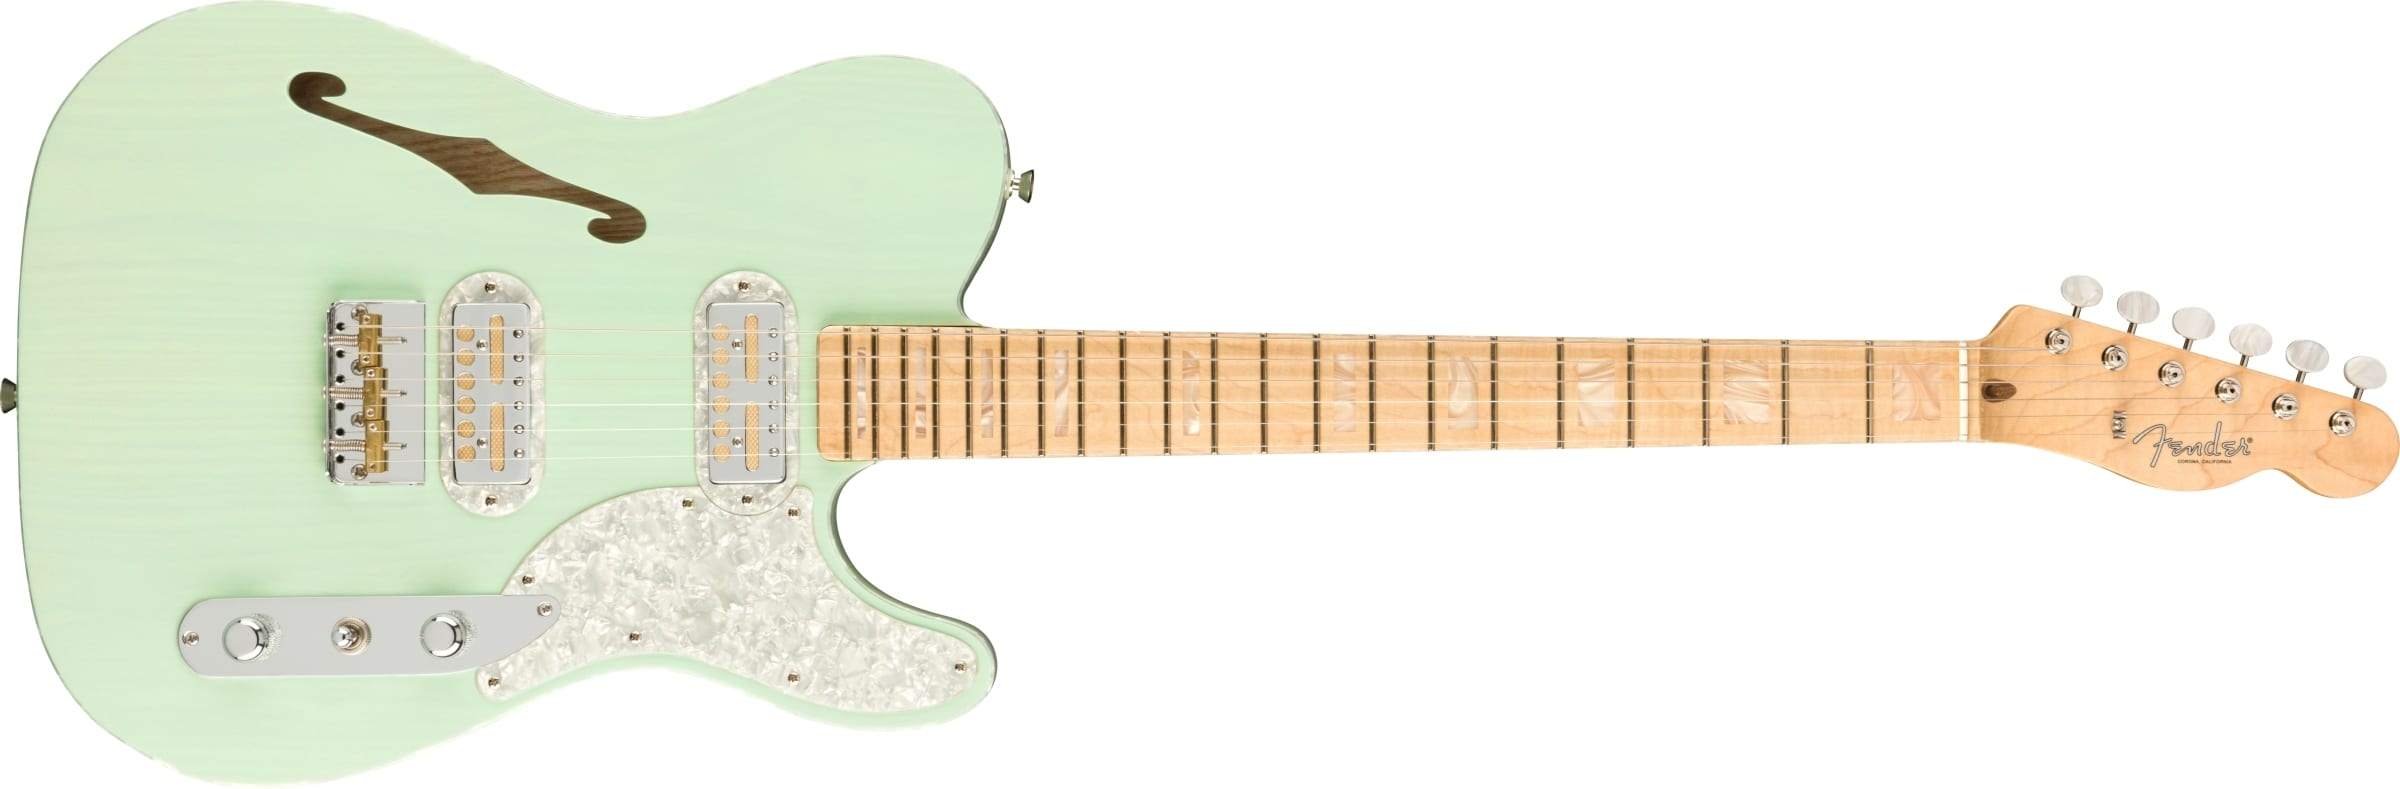 Fender Parallel Universe Volume II Tele Mágico Trans Surf Green